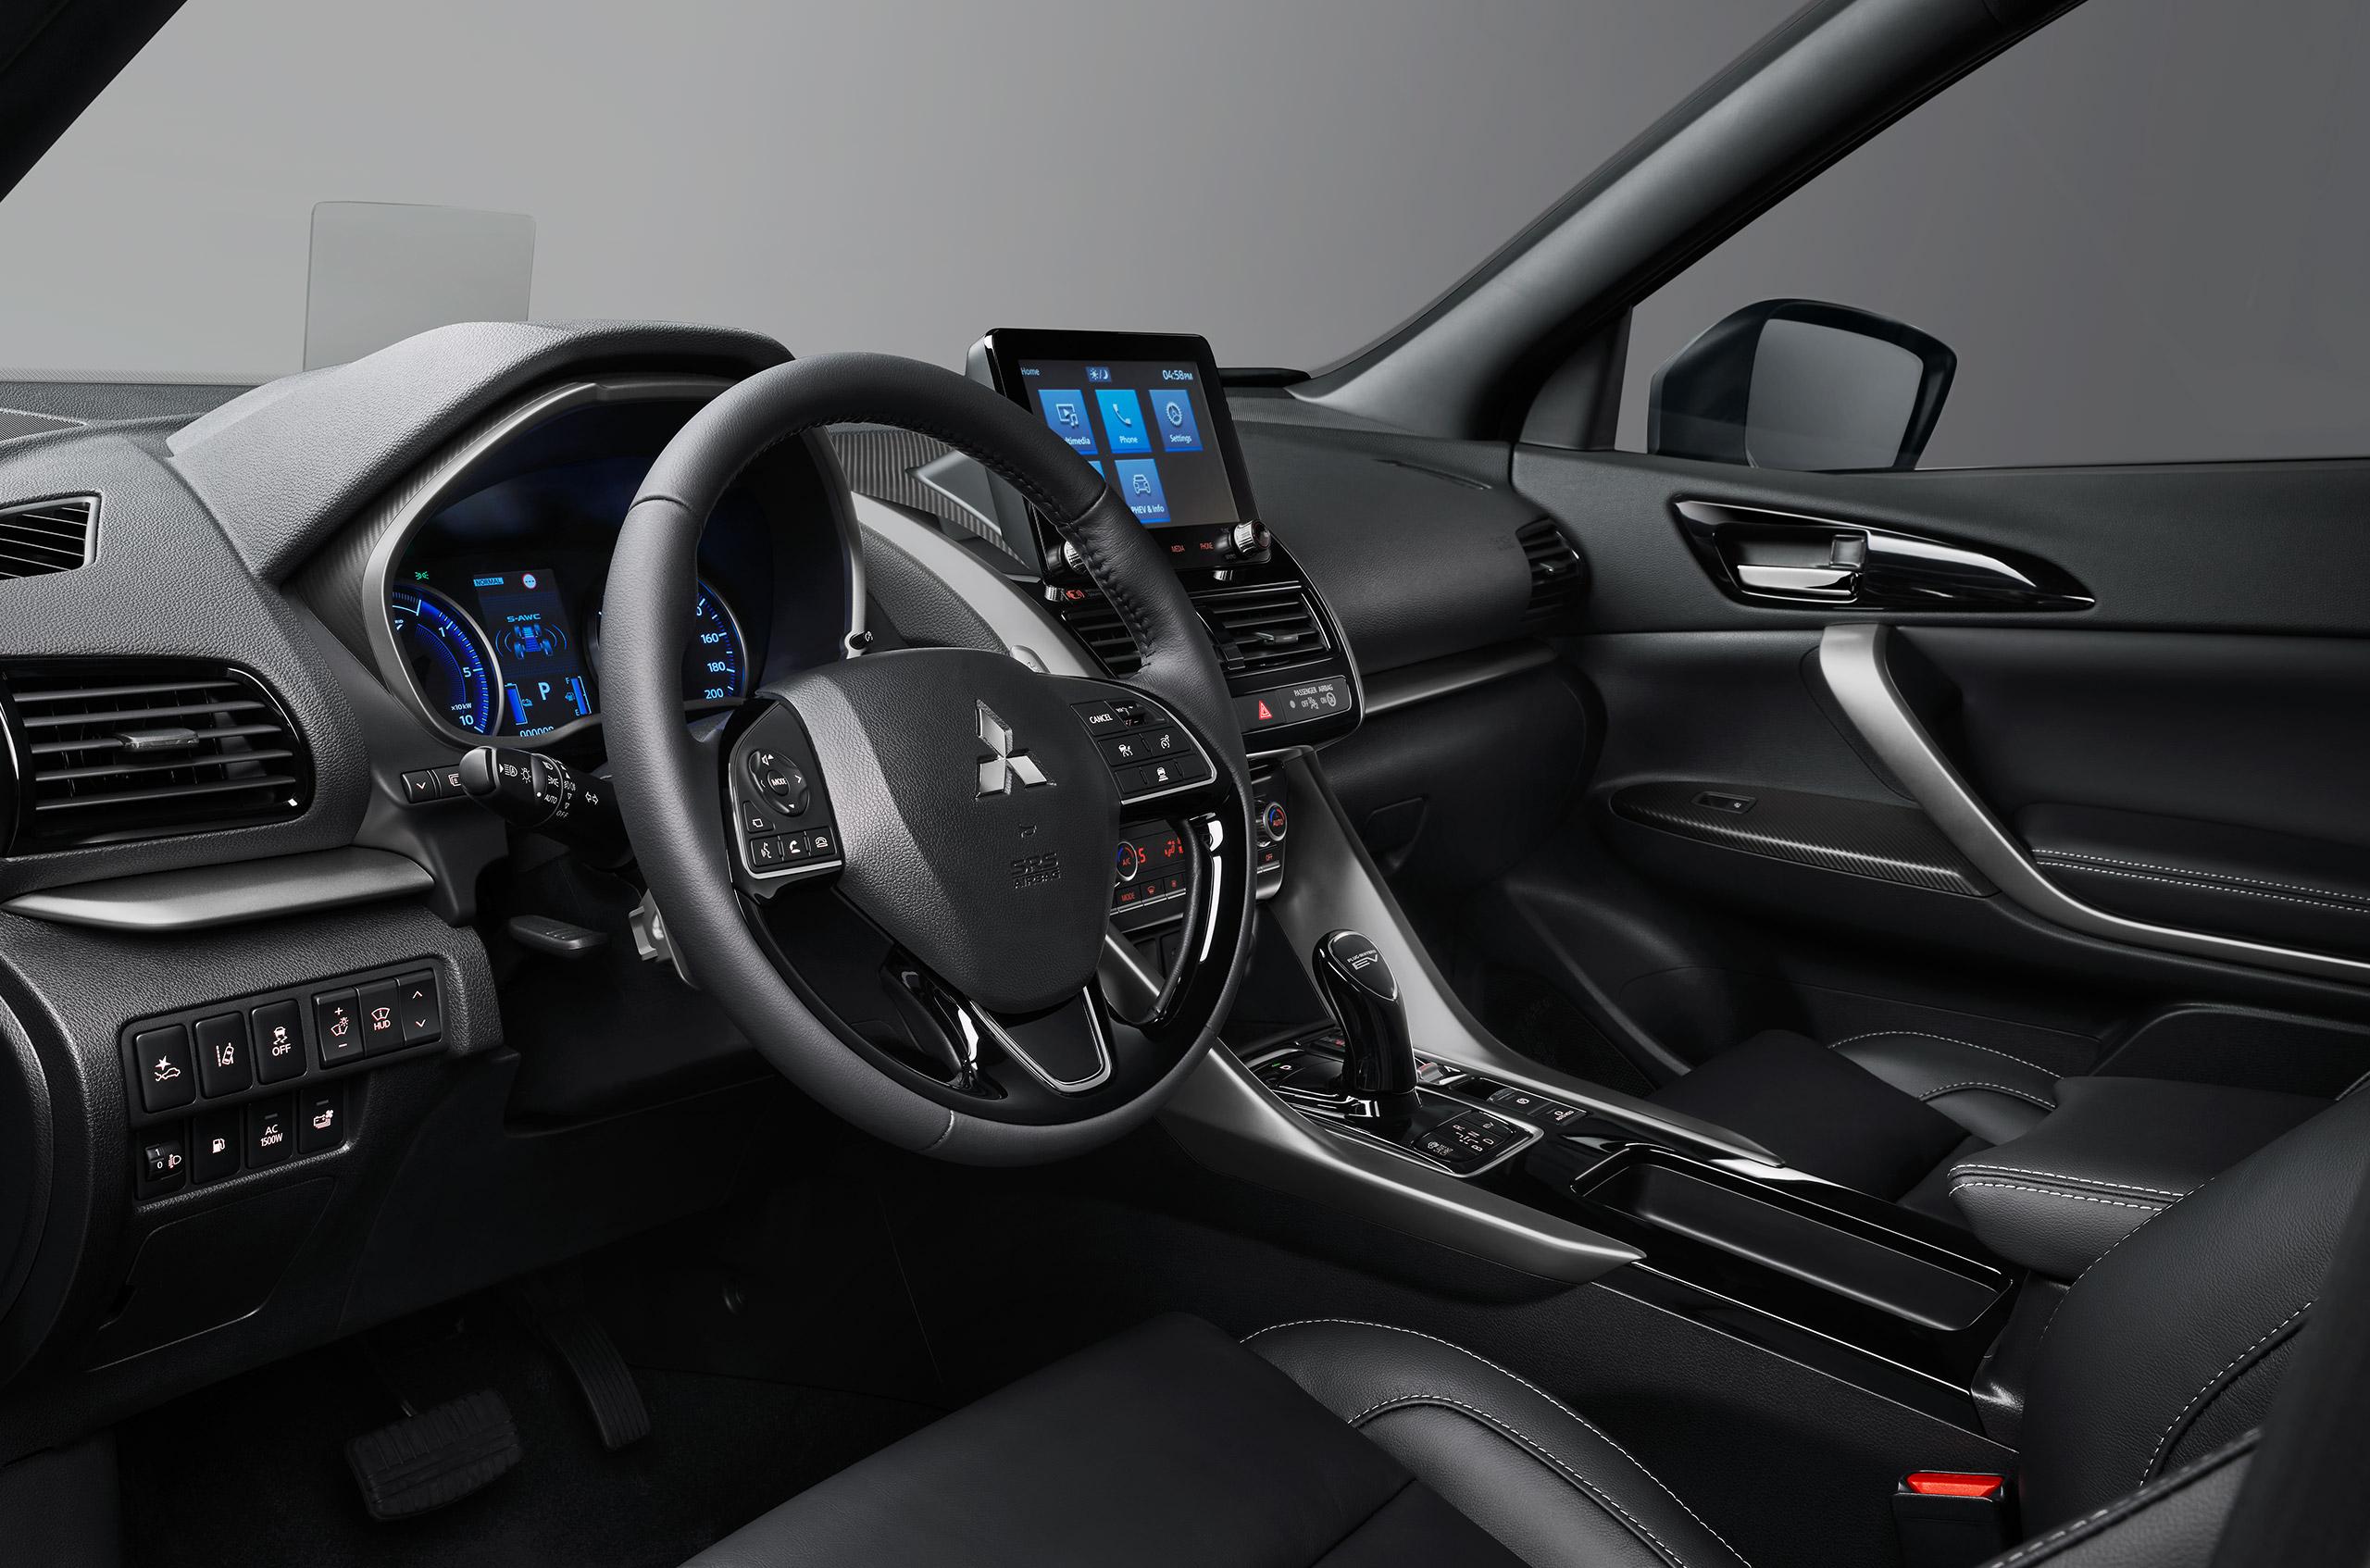 Innenraum im Mitsubishi Eclipse Cross Plugin Bildquelle: mitsubishi-motors.de